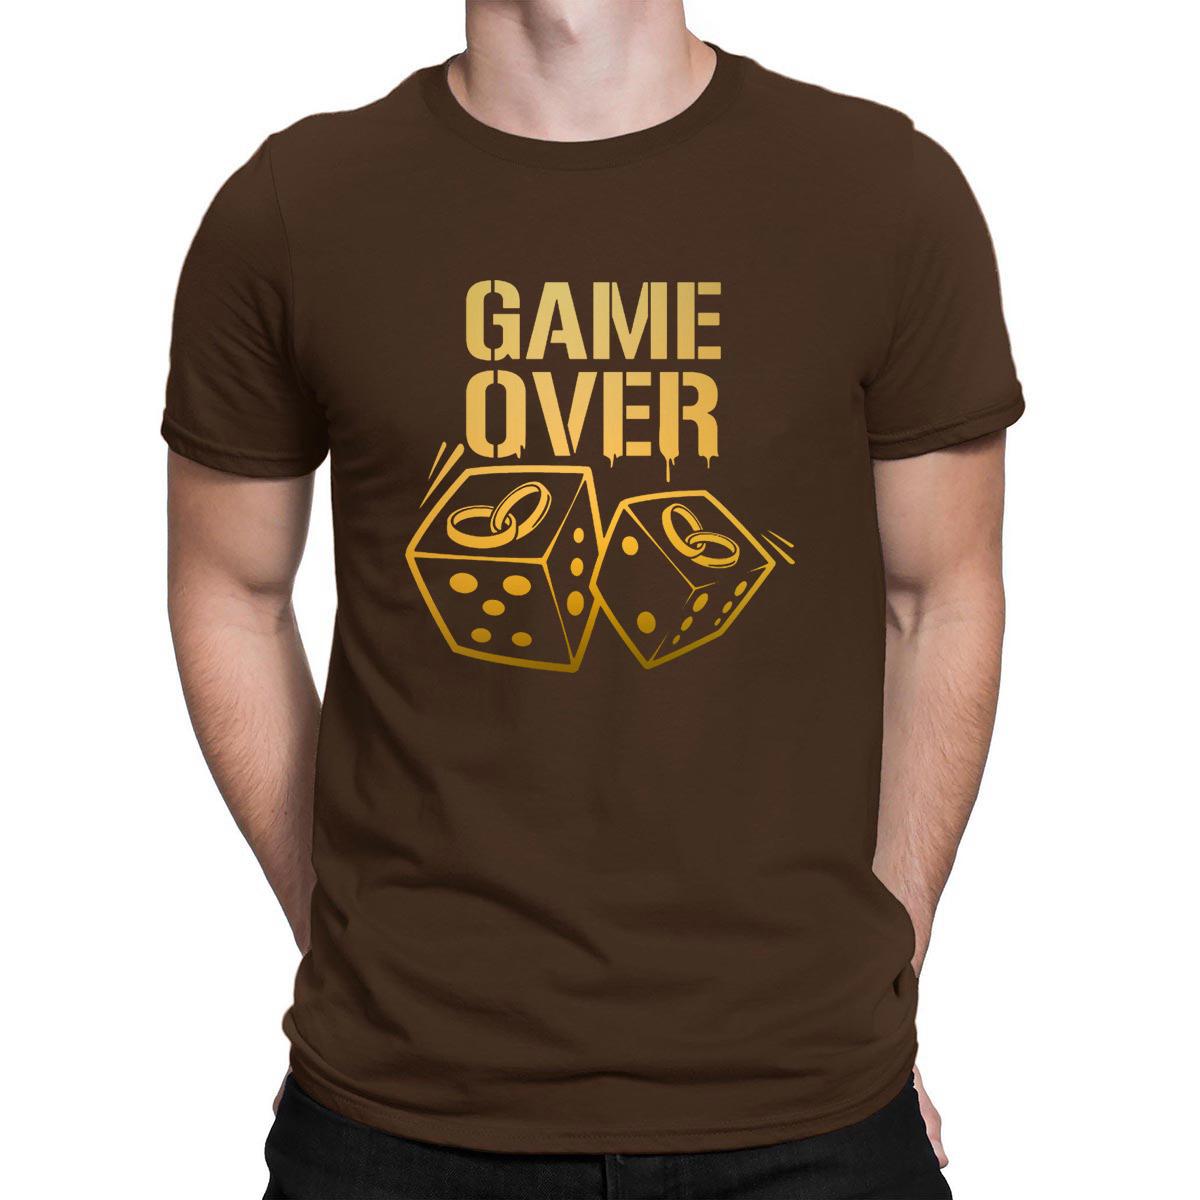 Game Over T-Shirt Best Pop Top Tee Original Euro Size Men's Tshirt Clever 2018 Printing Anlarach Graphic